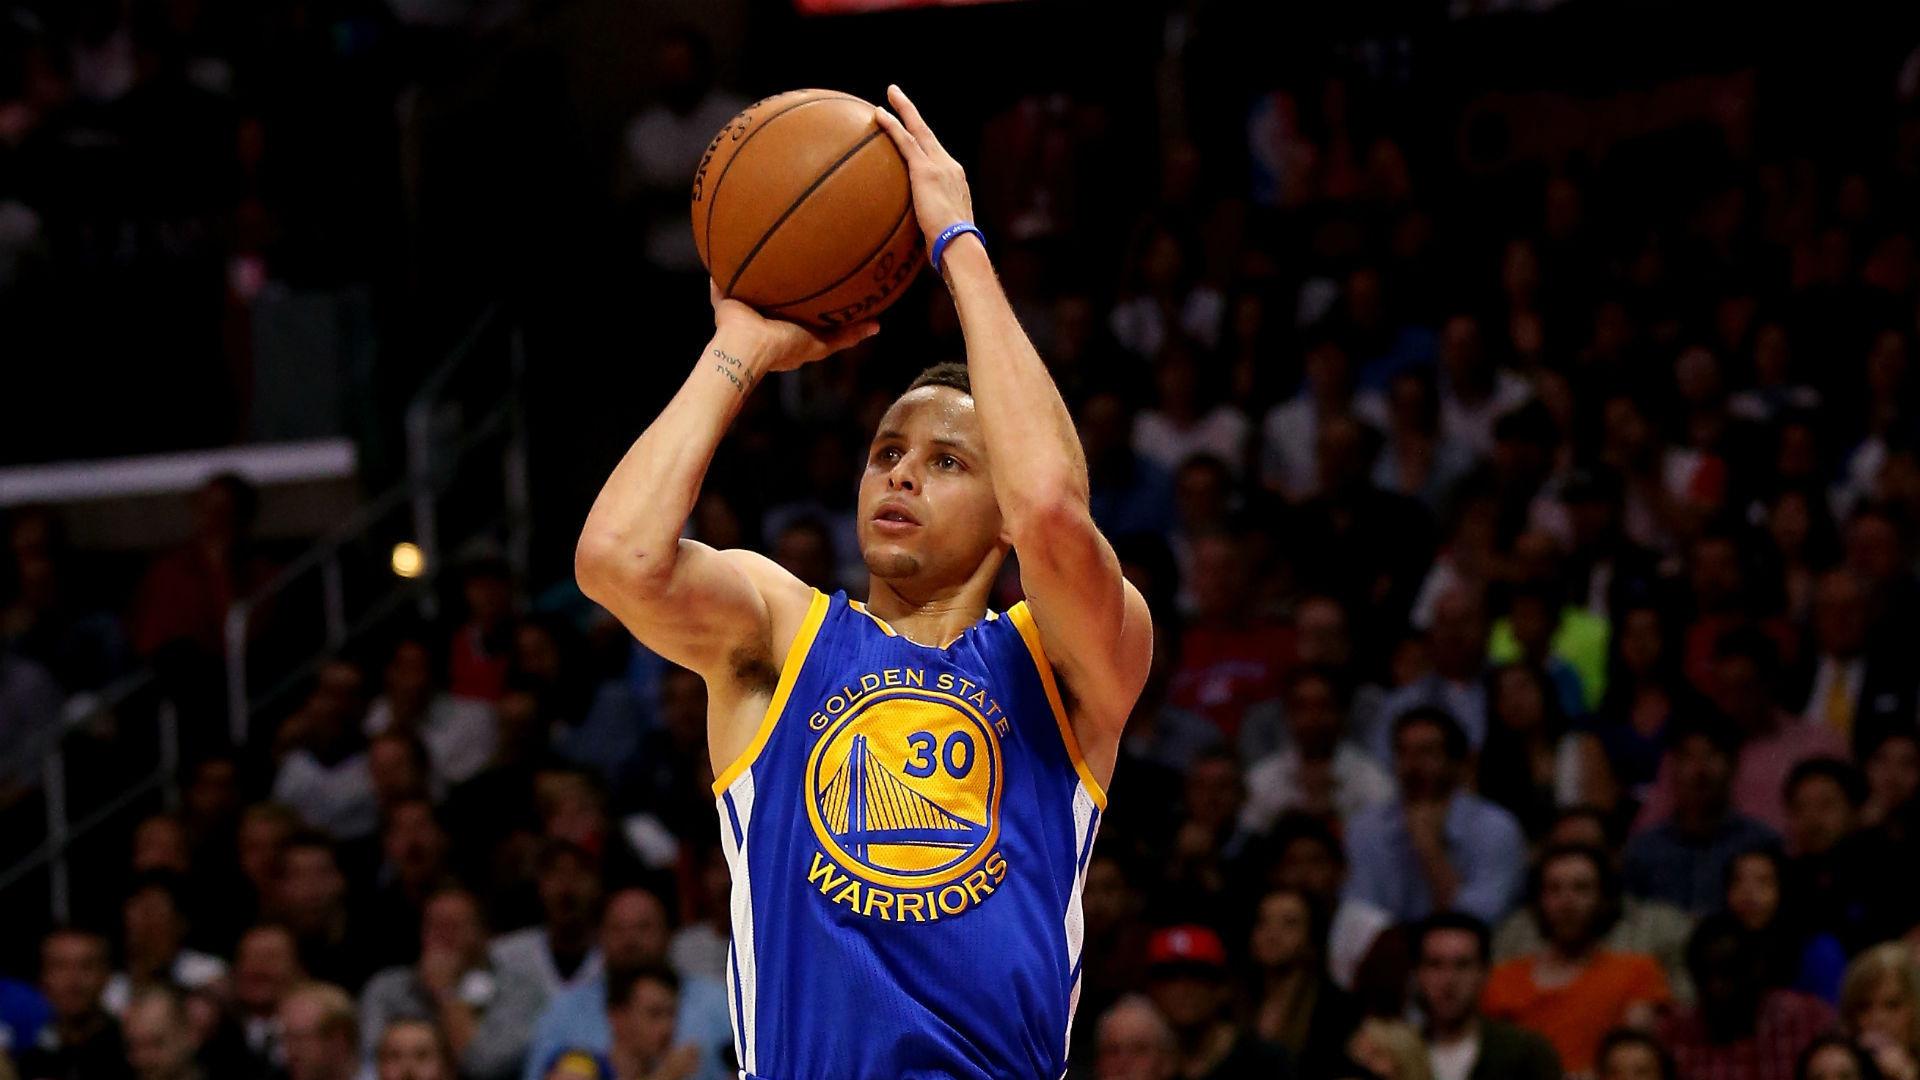 Stephen Curry Basketball Wallpaper